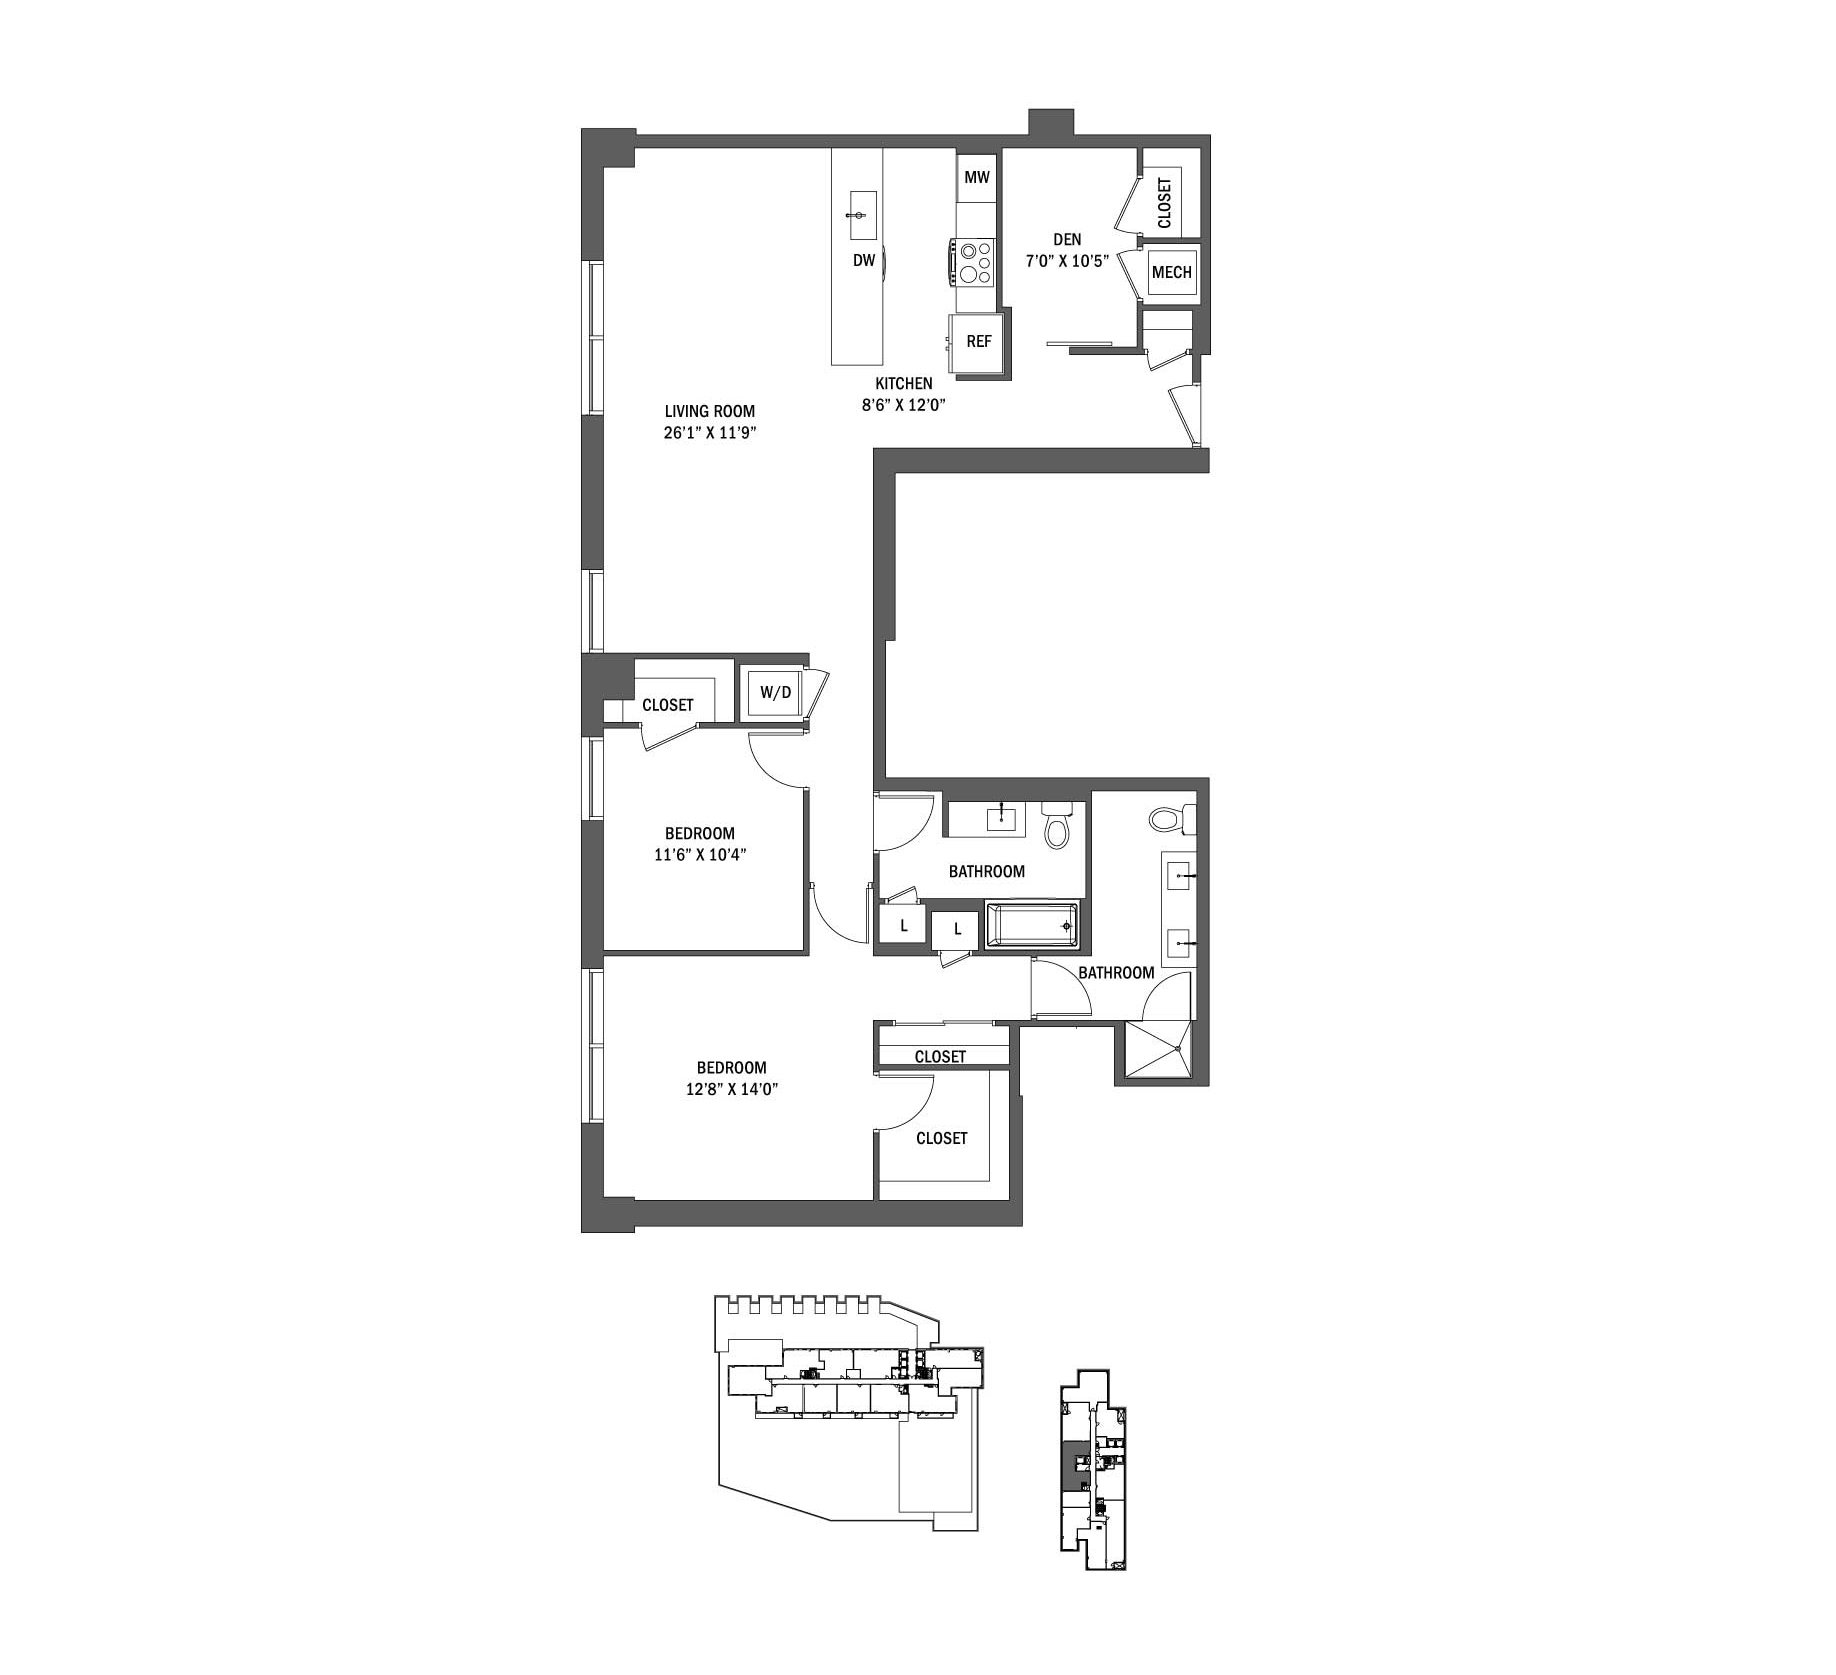 P0625338 789bcd04 e05 18p 2 floorplan